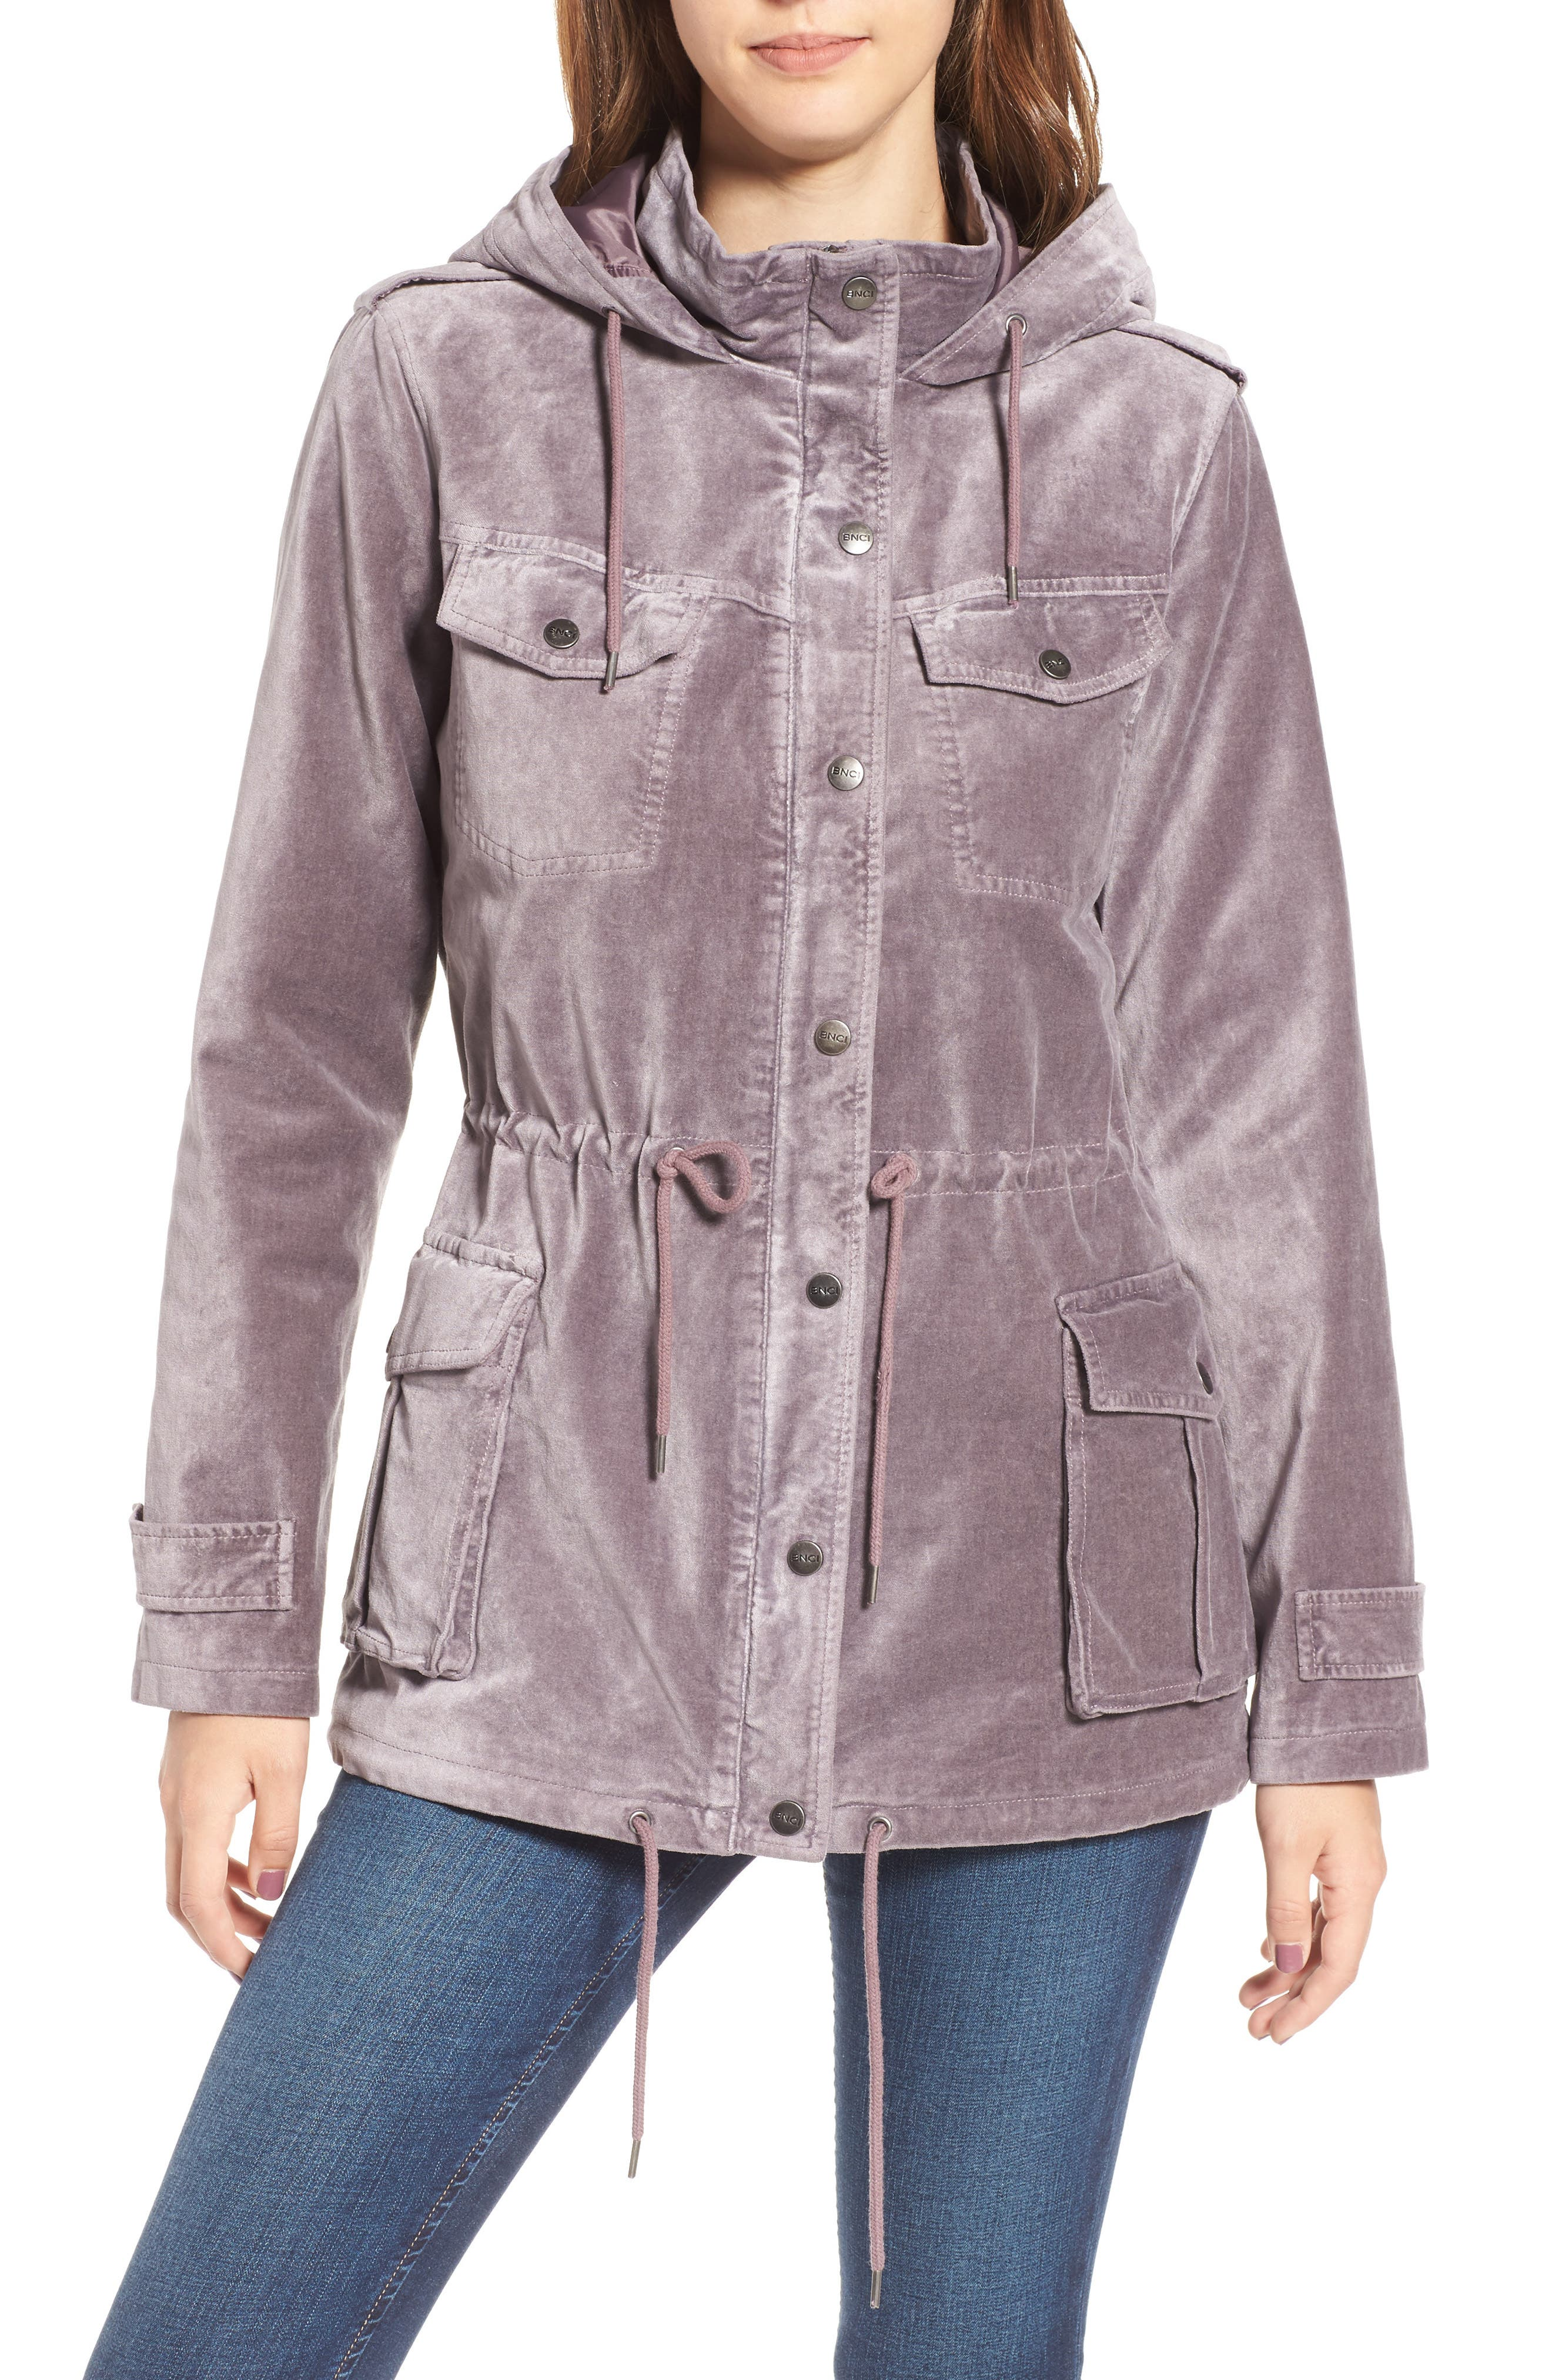 BNCI Cotton Velveteen Hooded Anorak Jacket,                             Alternate thumbnail 8, color,